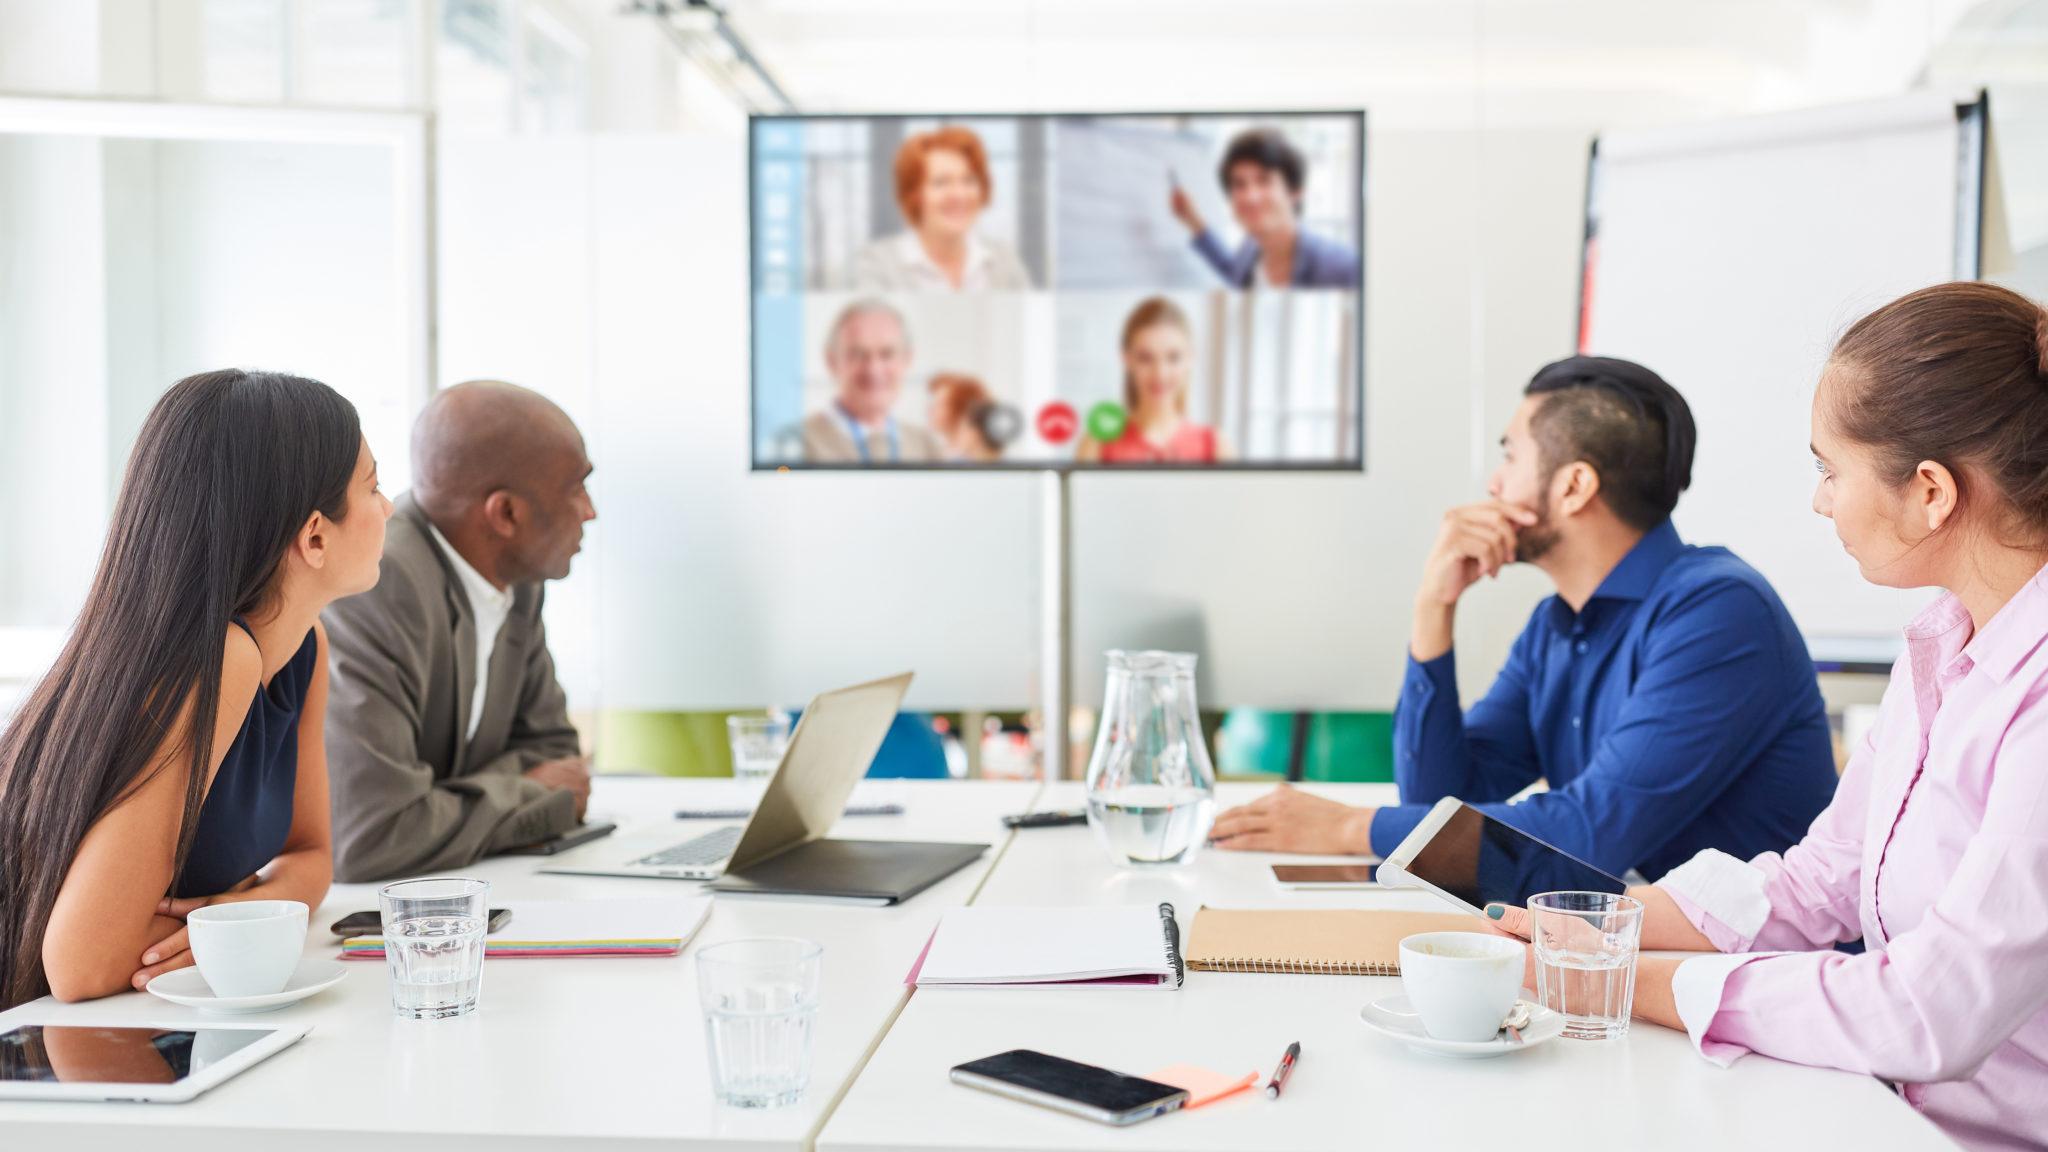 Planning Hybrid Meetings | How to Hold Productive Meetings in Microsoft Teams Room